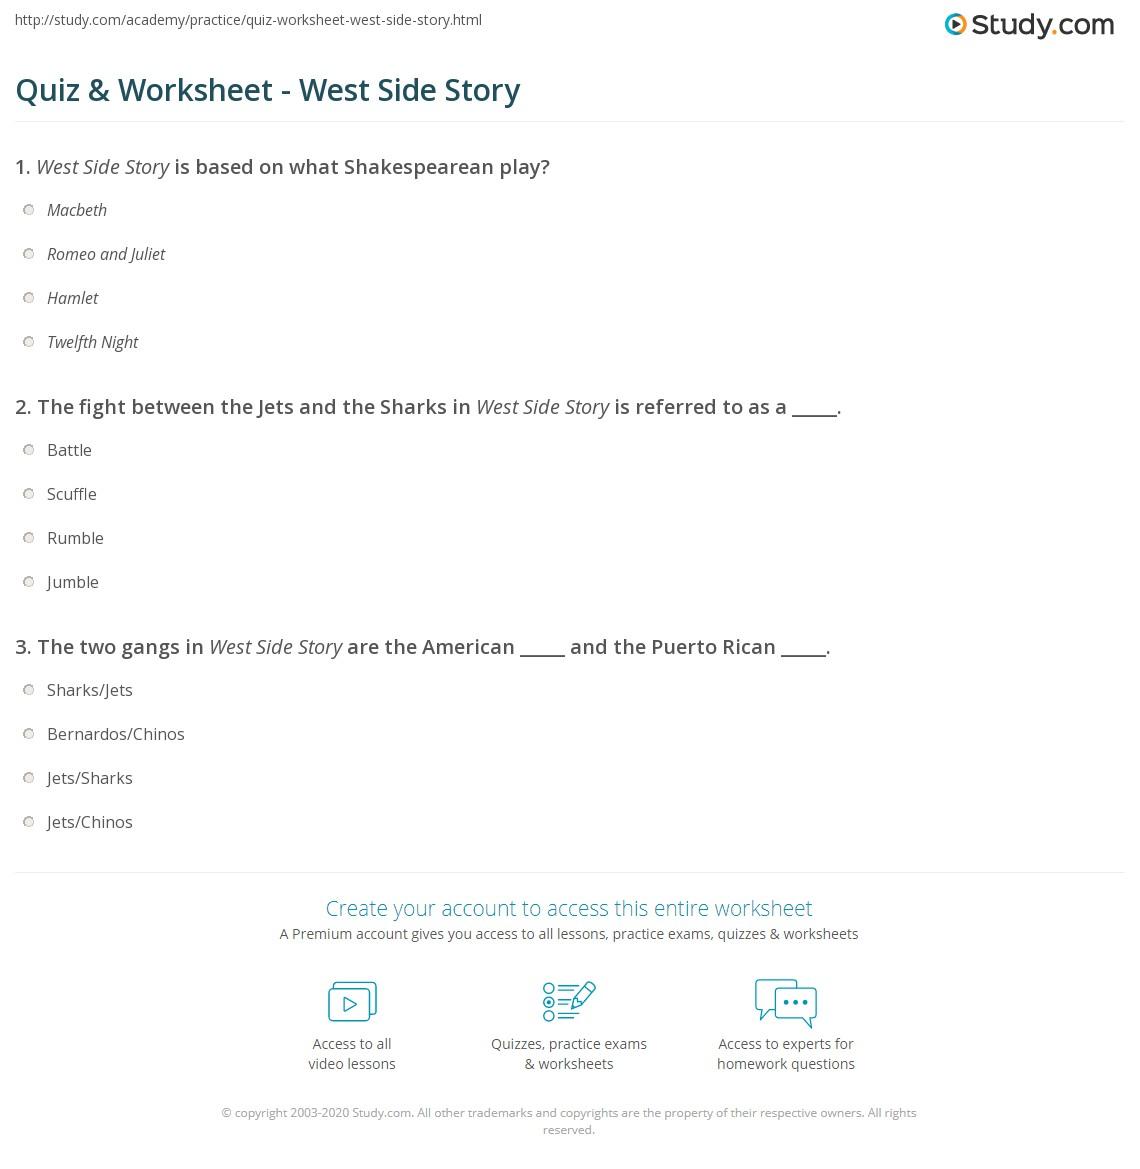 worksheet West Side Story Worksheet quiz worksheet west side story study com print summary songs characters composer worksheet